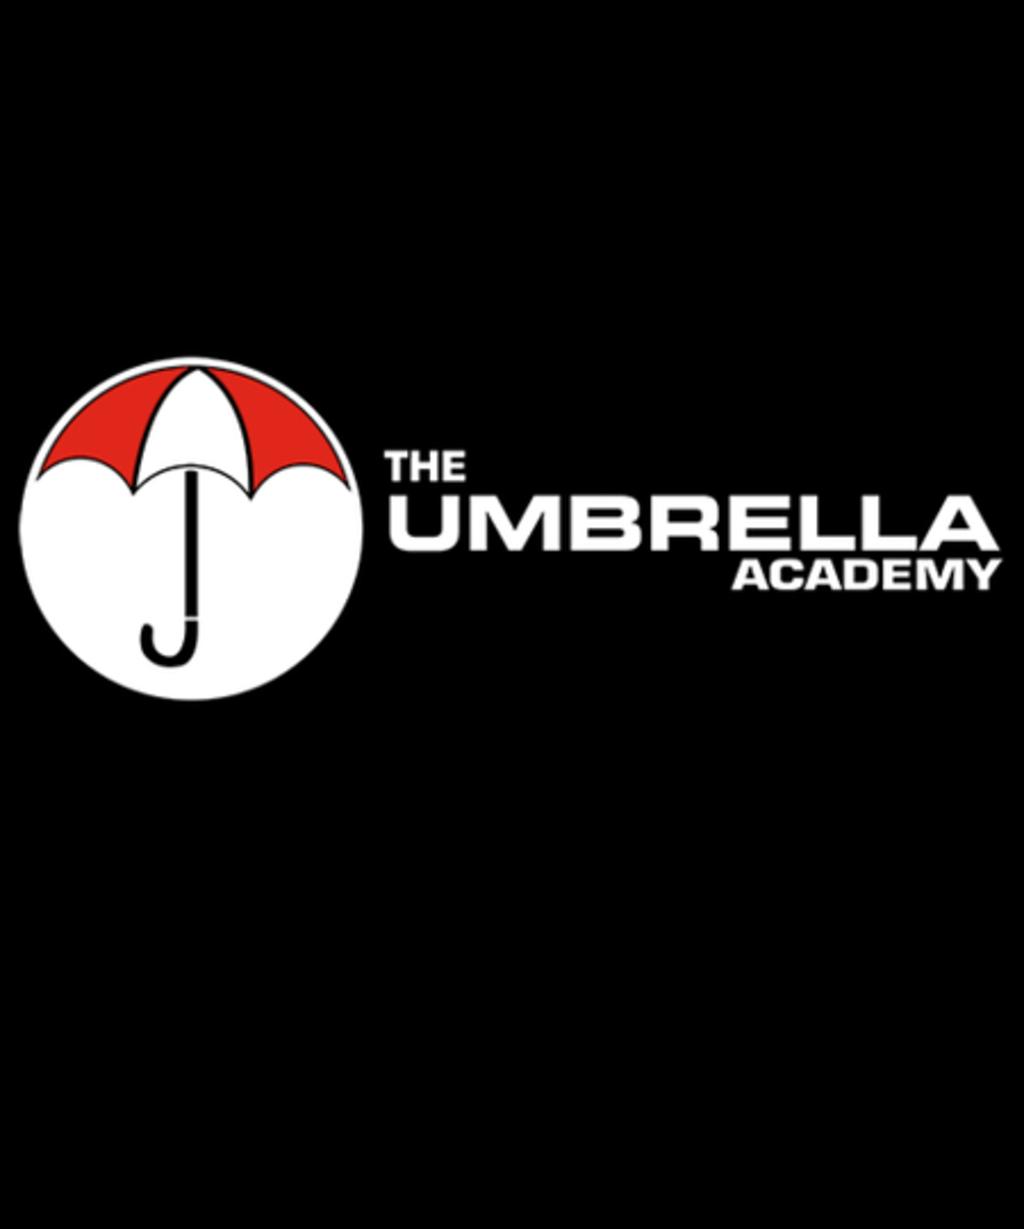 Qwertee: Other Umbrella